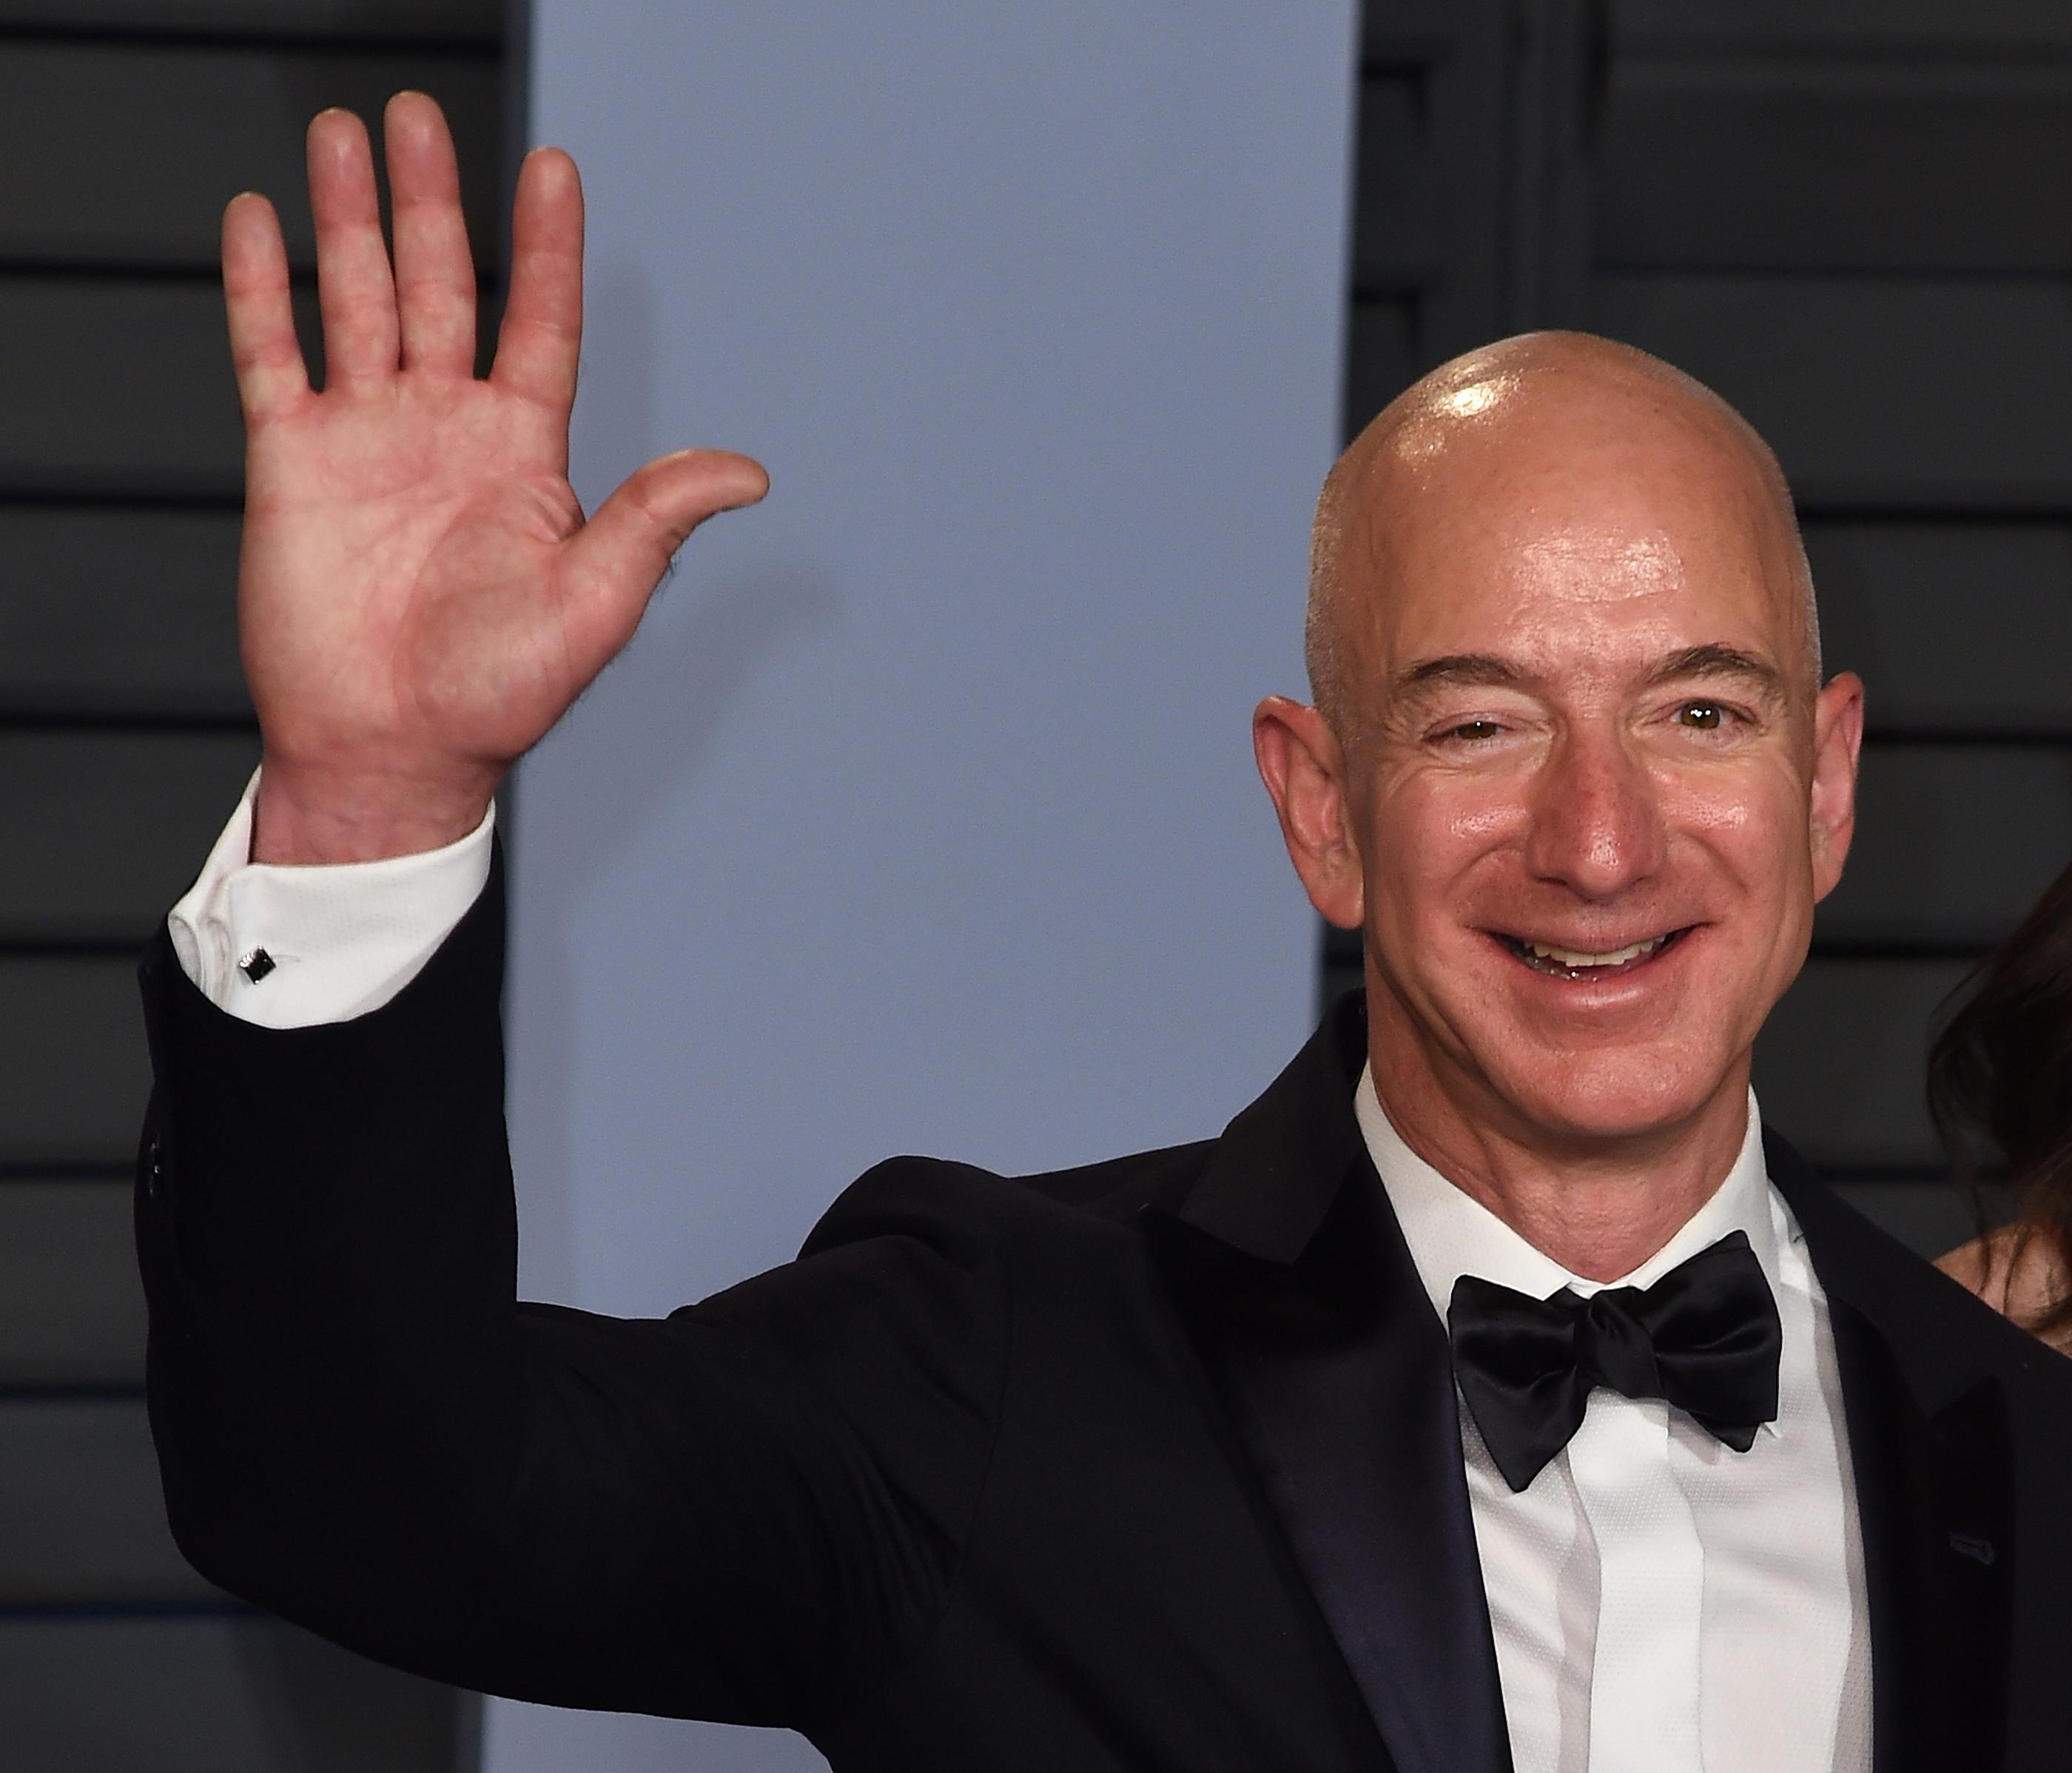 Jeff Bezos Makes the Median Amazon Salary Every 9 Seconds ...